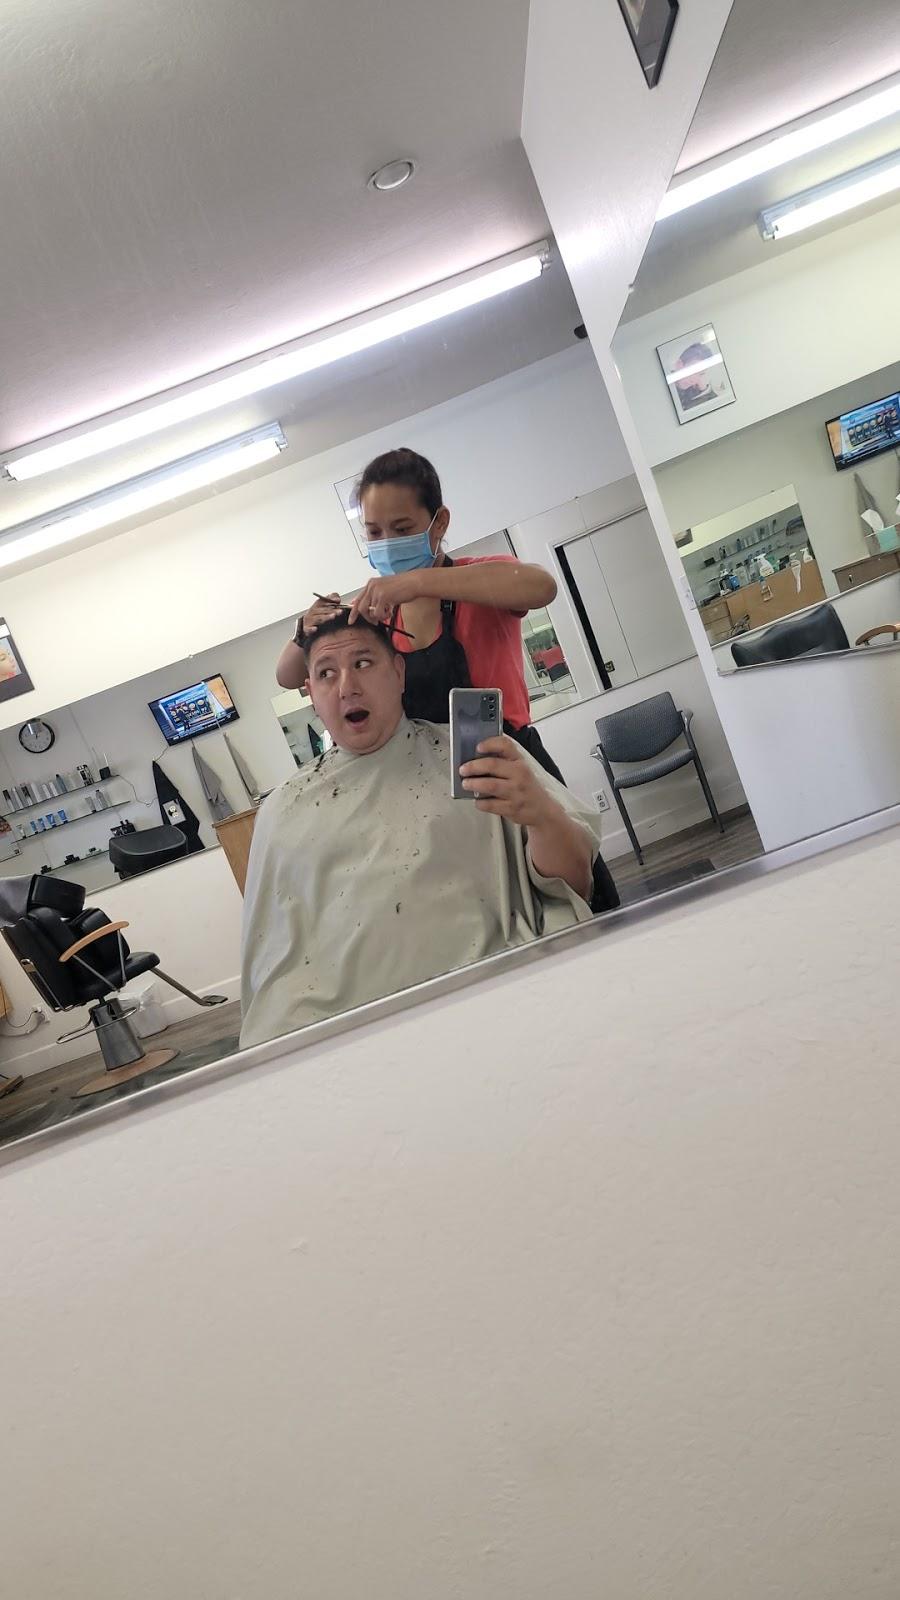 Van Kool Cuts - hair care    Photo 1 of 1   Address: 100 W Turner Rd C, Lodi, CA 95240, USA   Phone: (209) 333-5298